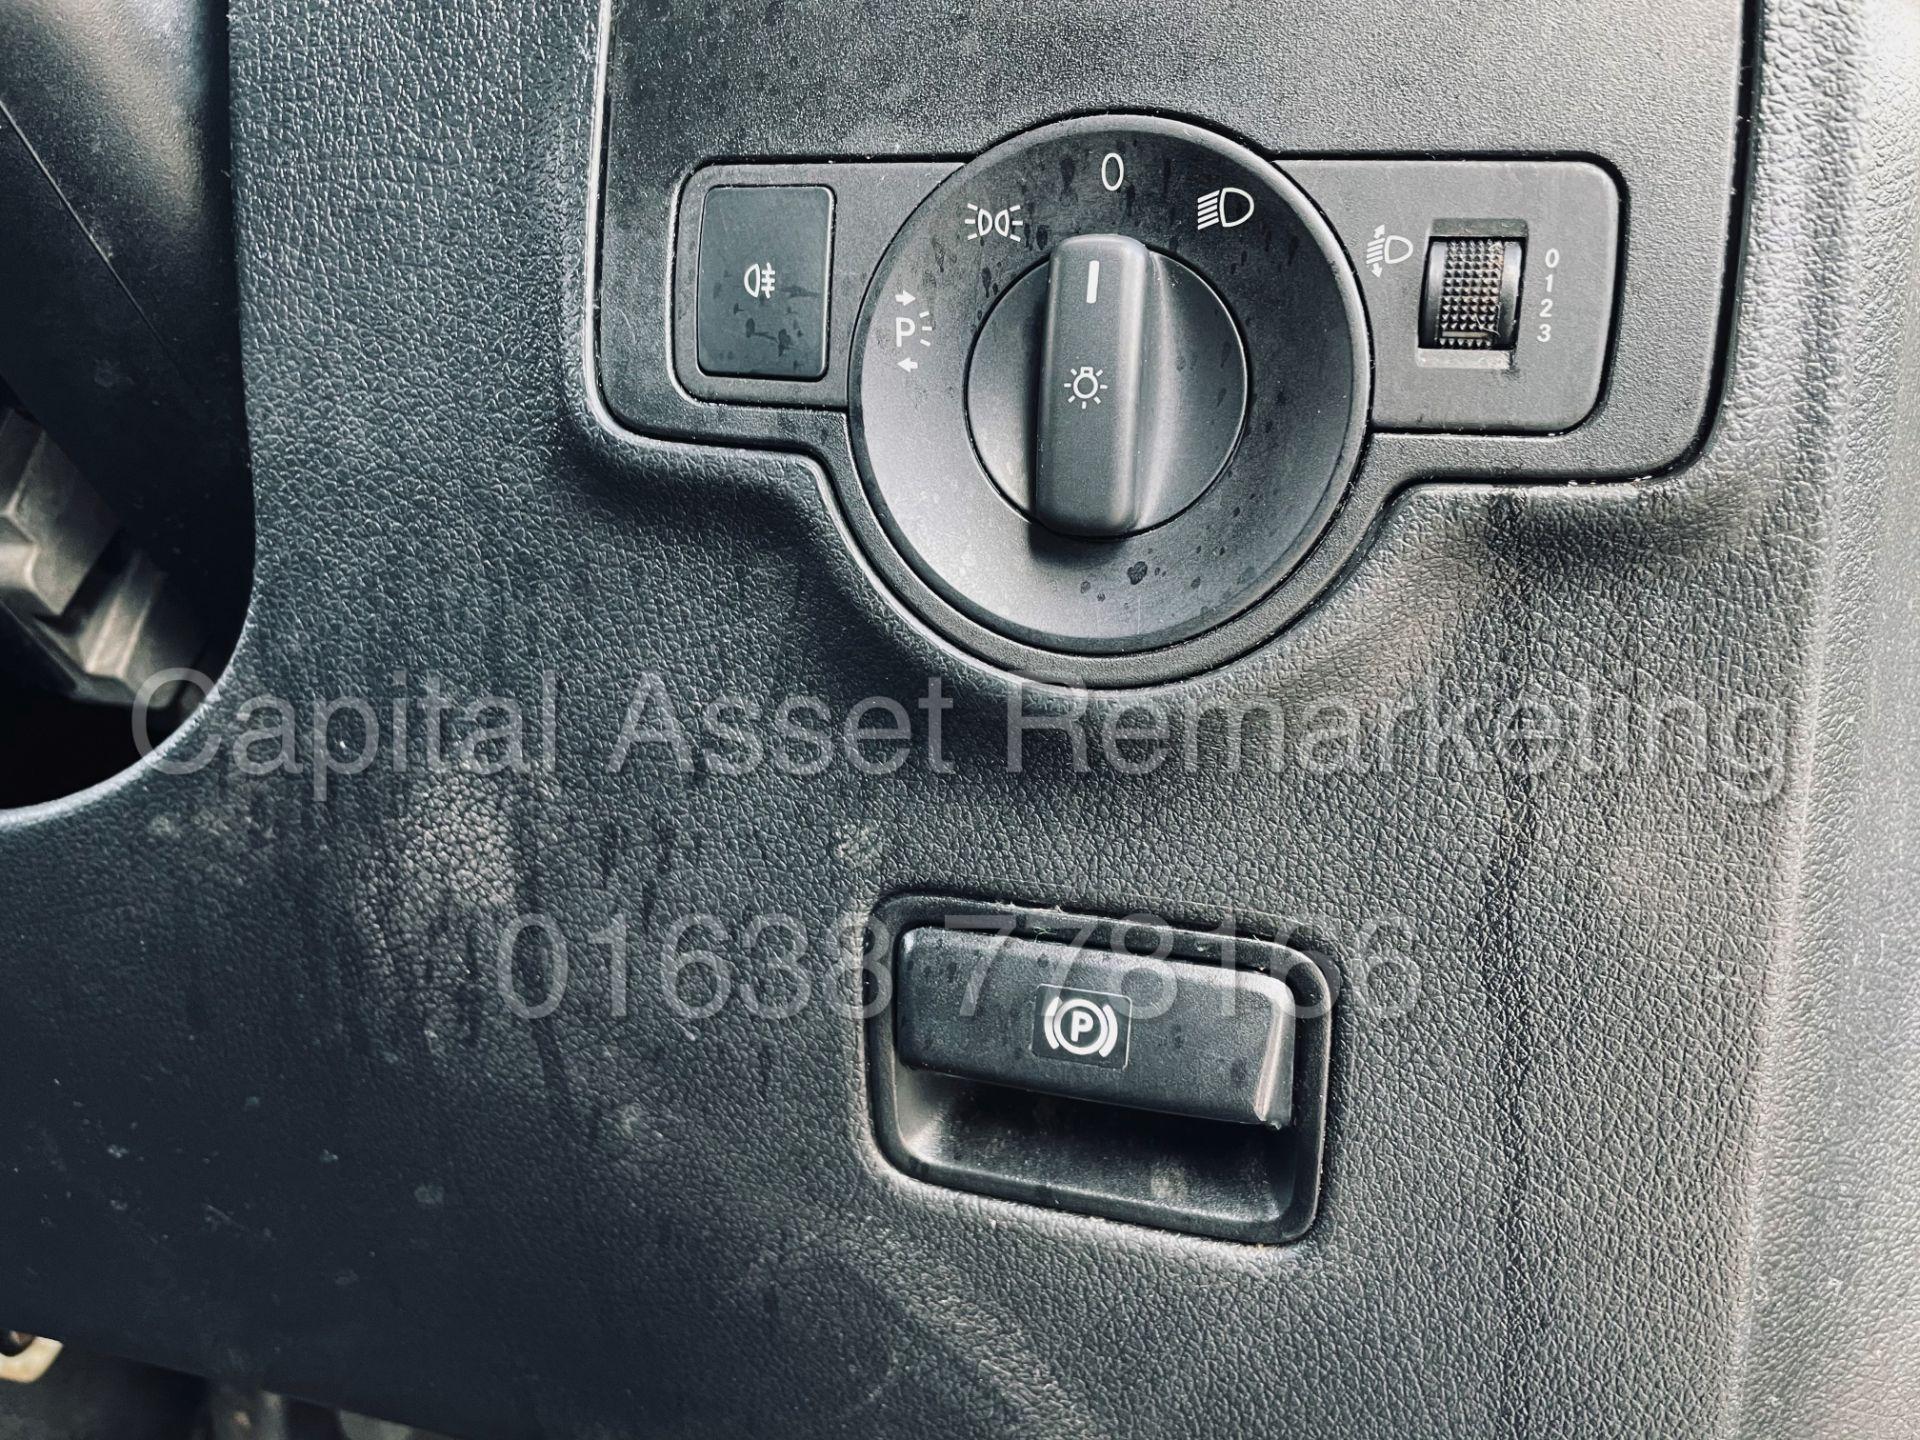 (On Sale) MERCEDES-BENZ VITO 114 *LWB -PANEL VAN* (2017 - EURO 6) '134 BHP - 6 SPEED' *65,000 MILES* - Image 25 of 34